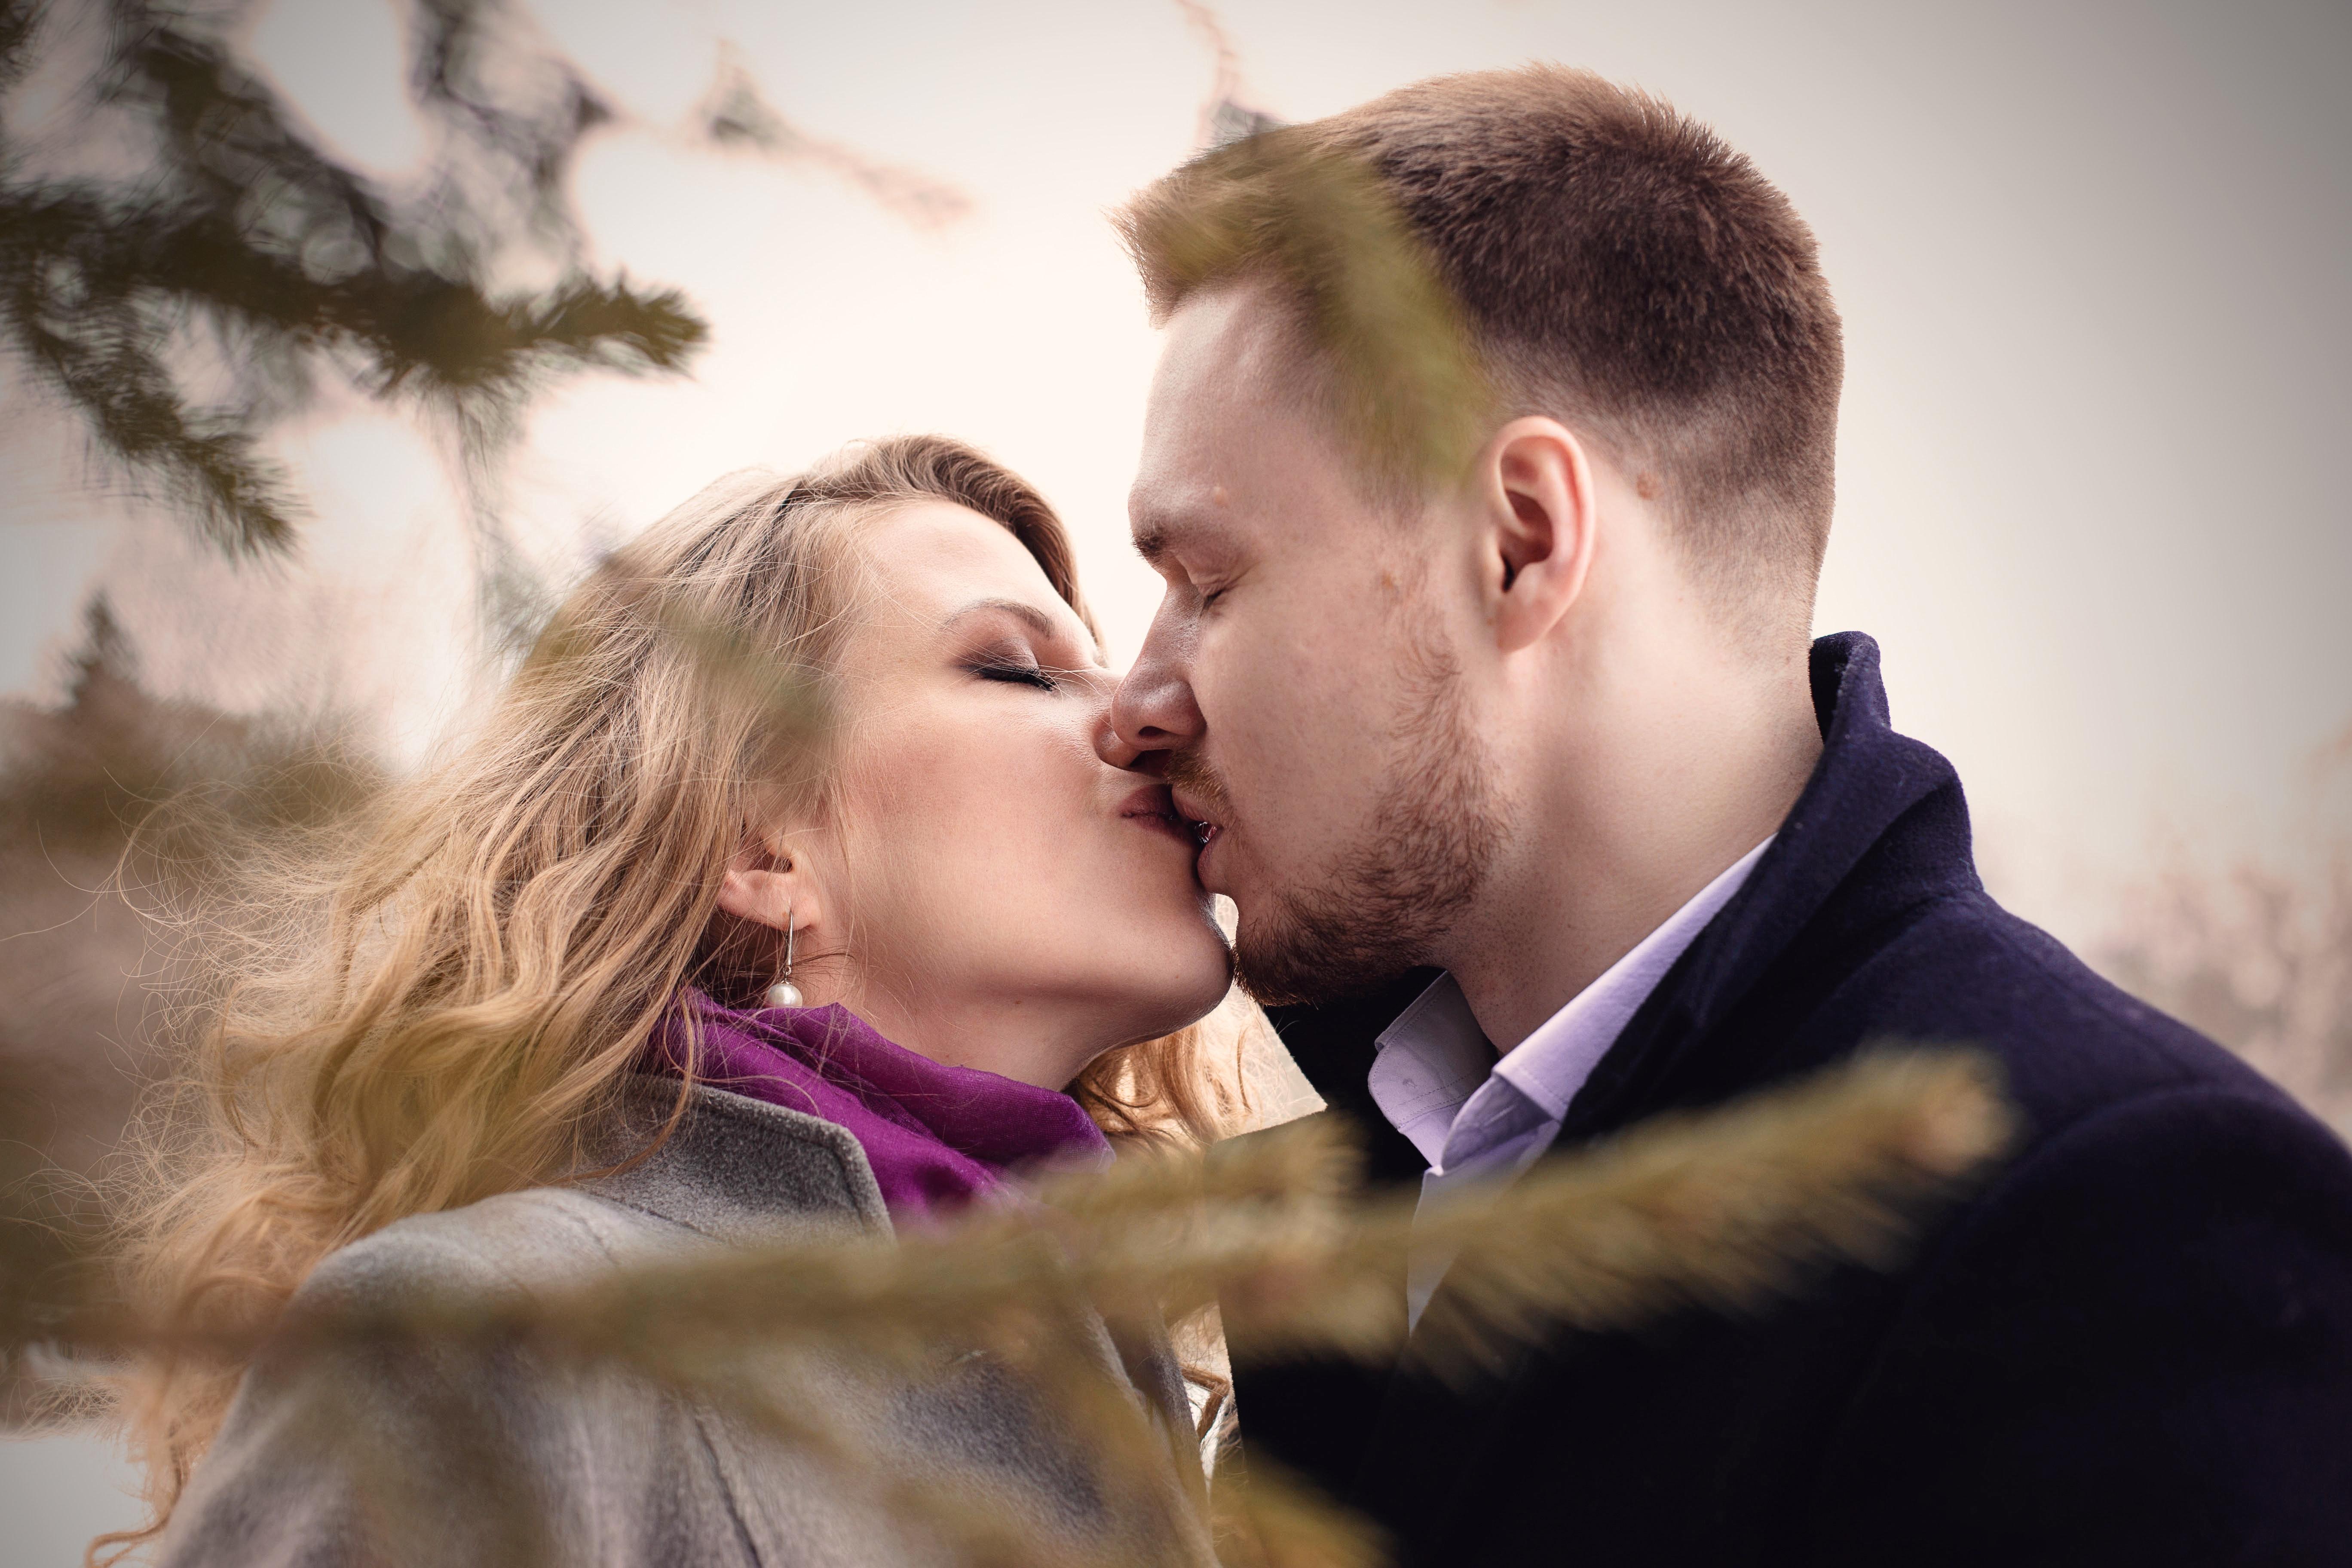 bacio gratis dating UK Bilbao incontri